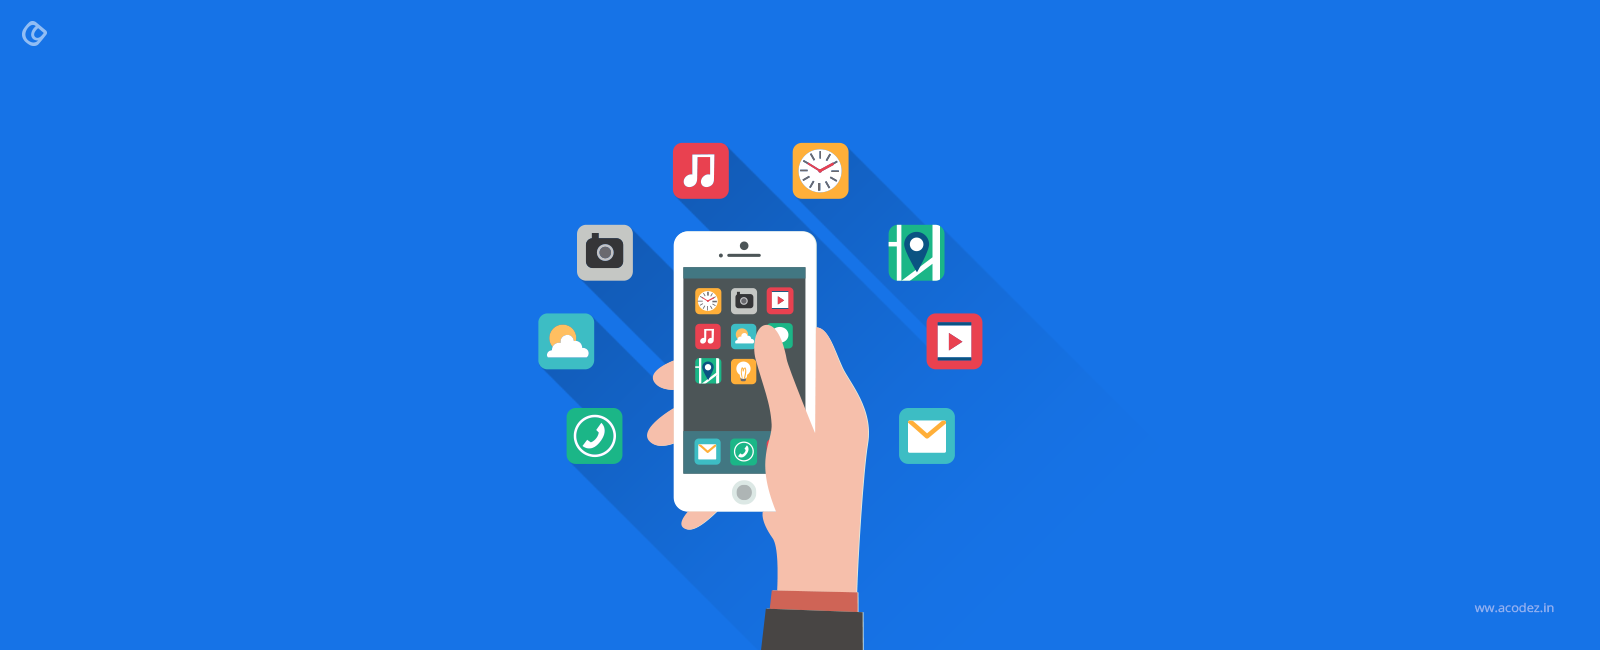 professional symbian programming mobile solutions on the epoc platform